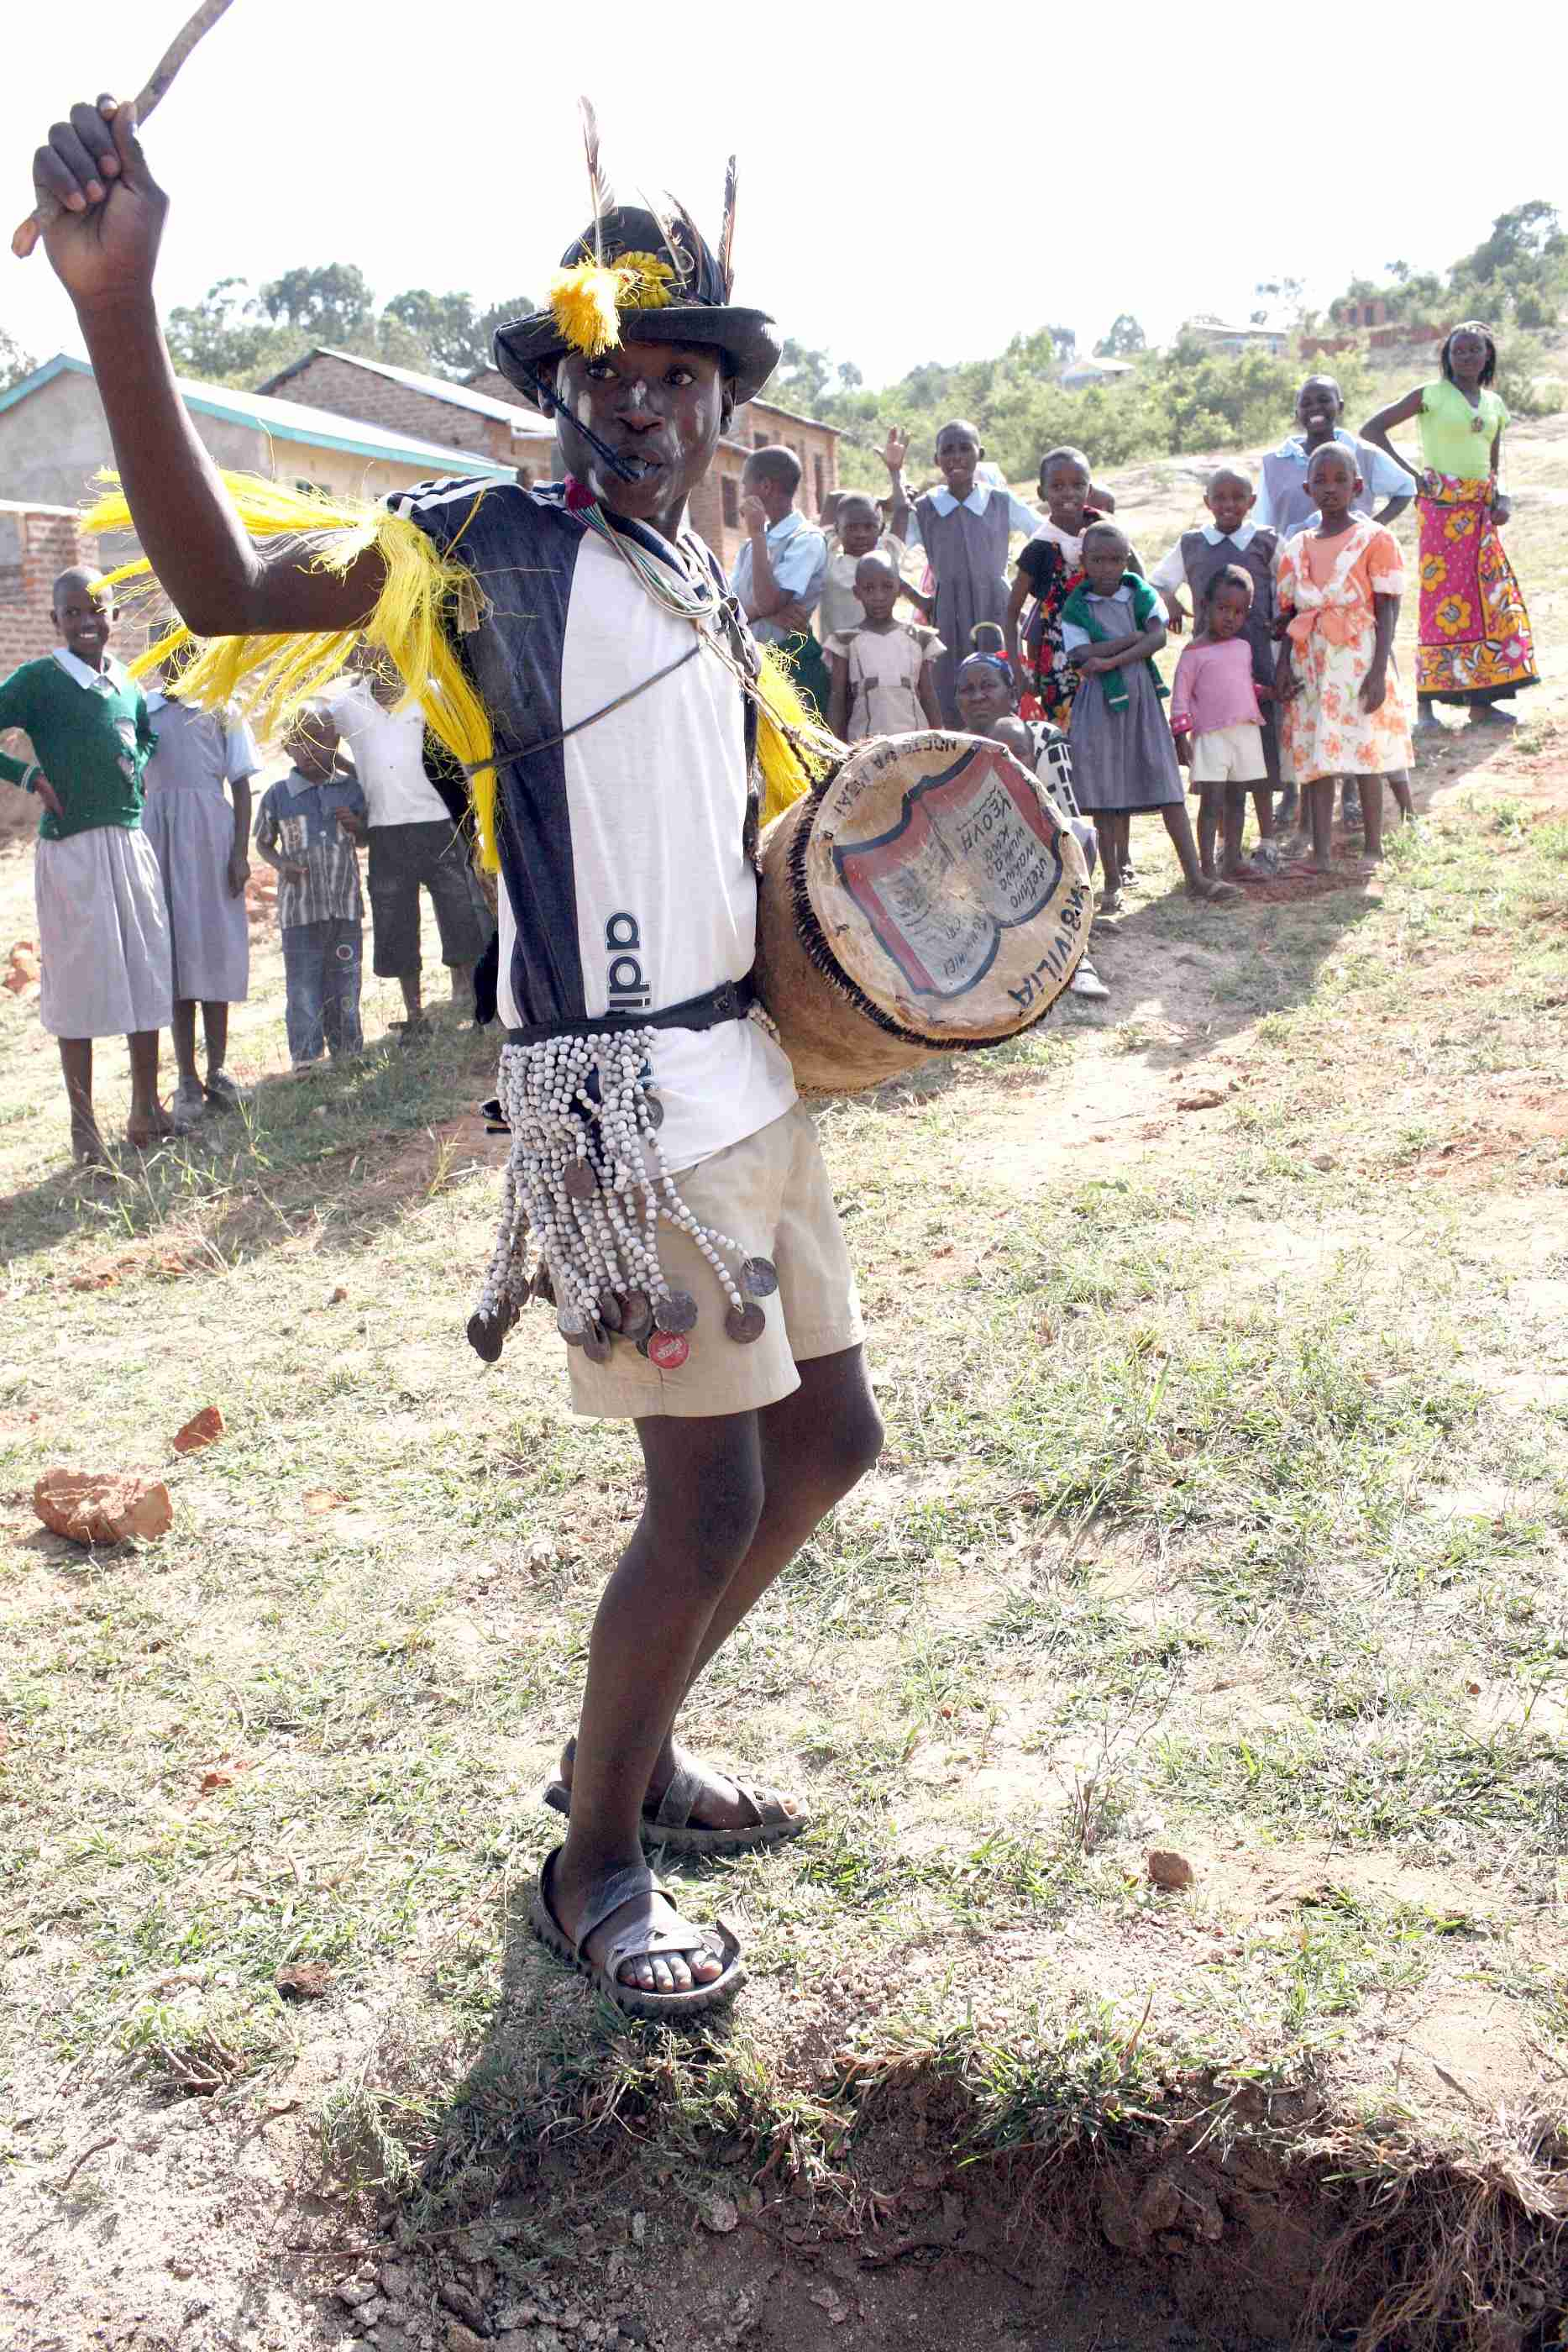 Alex performs at Harambee at Mulundi-Kwa Muema Secondary School